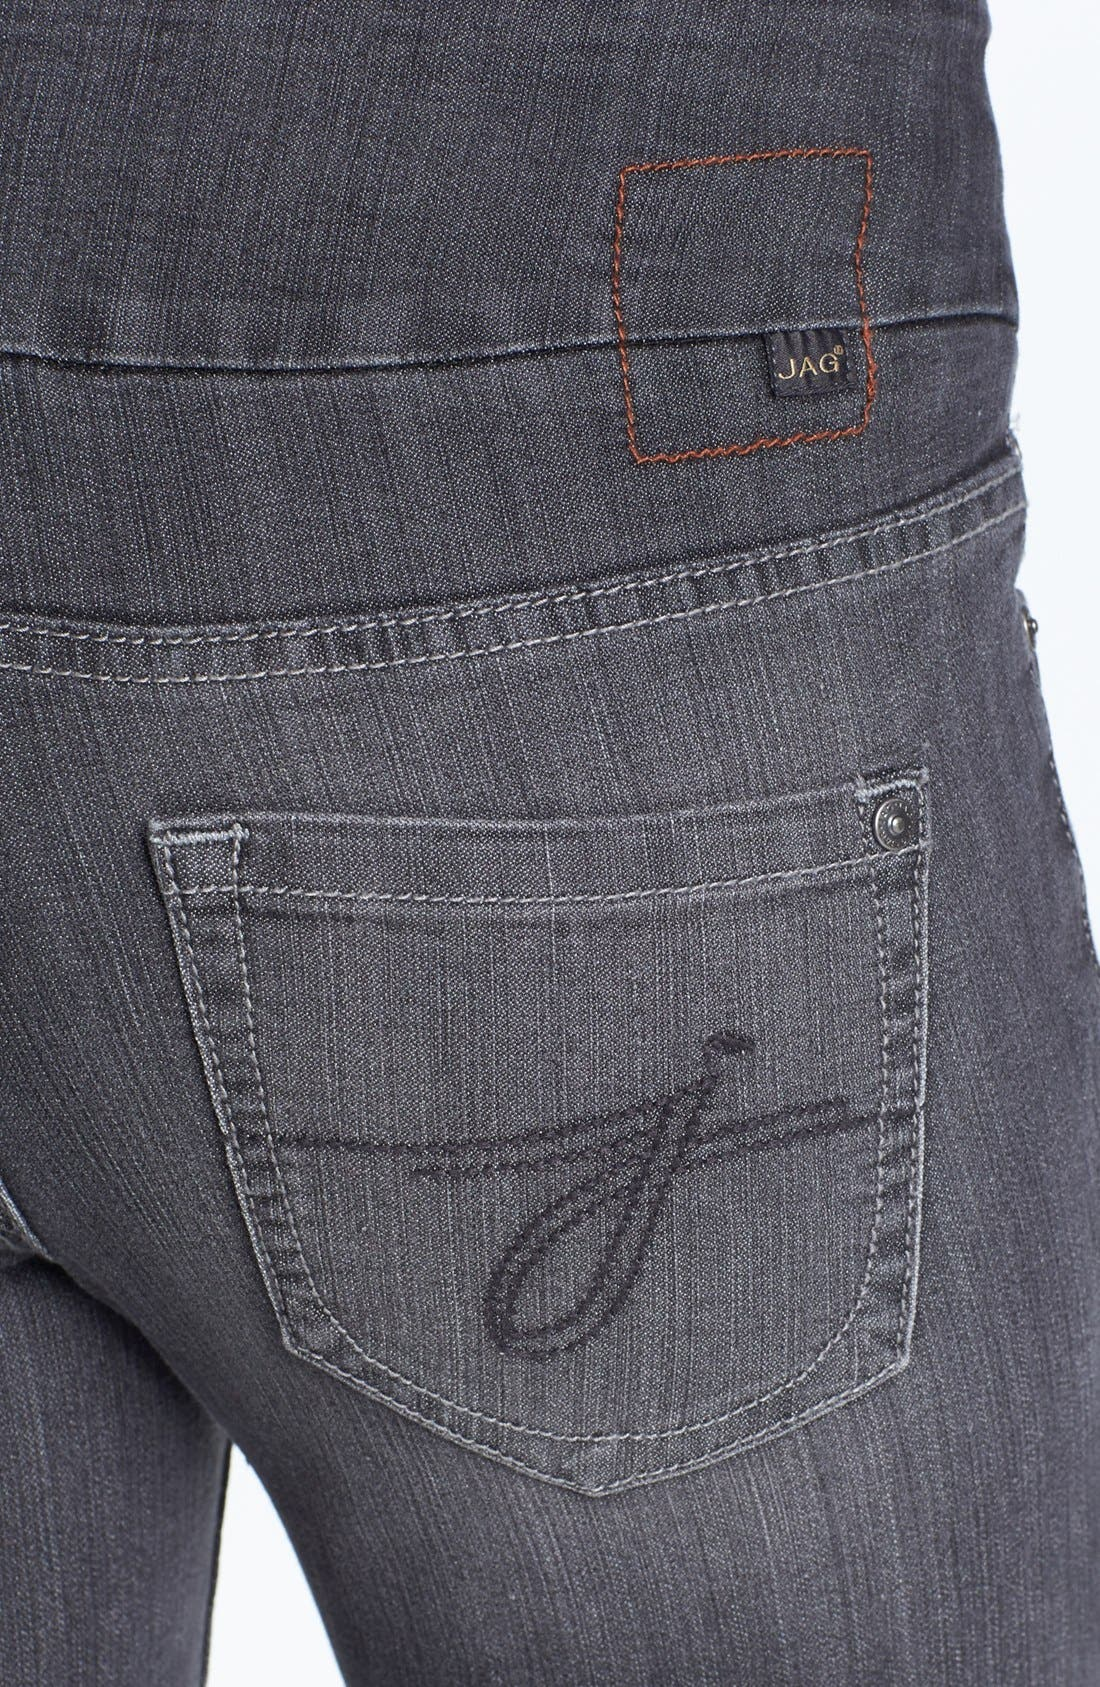 Alternate Image 3  - Jag Jeans 'Malia' Slim Leg Stretch Jeans (Grey)